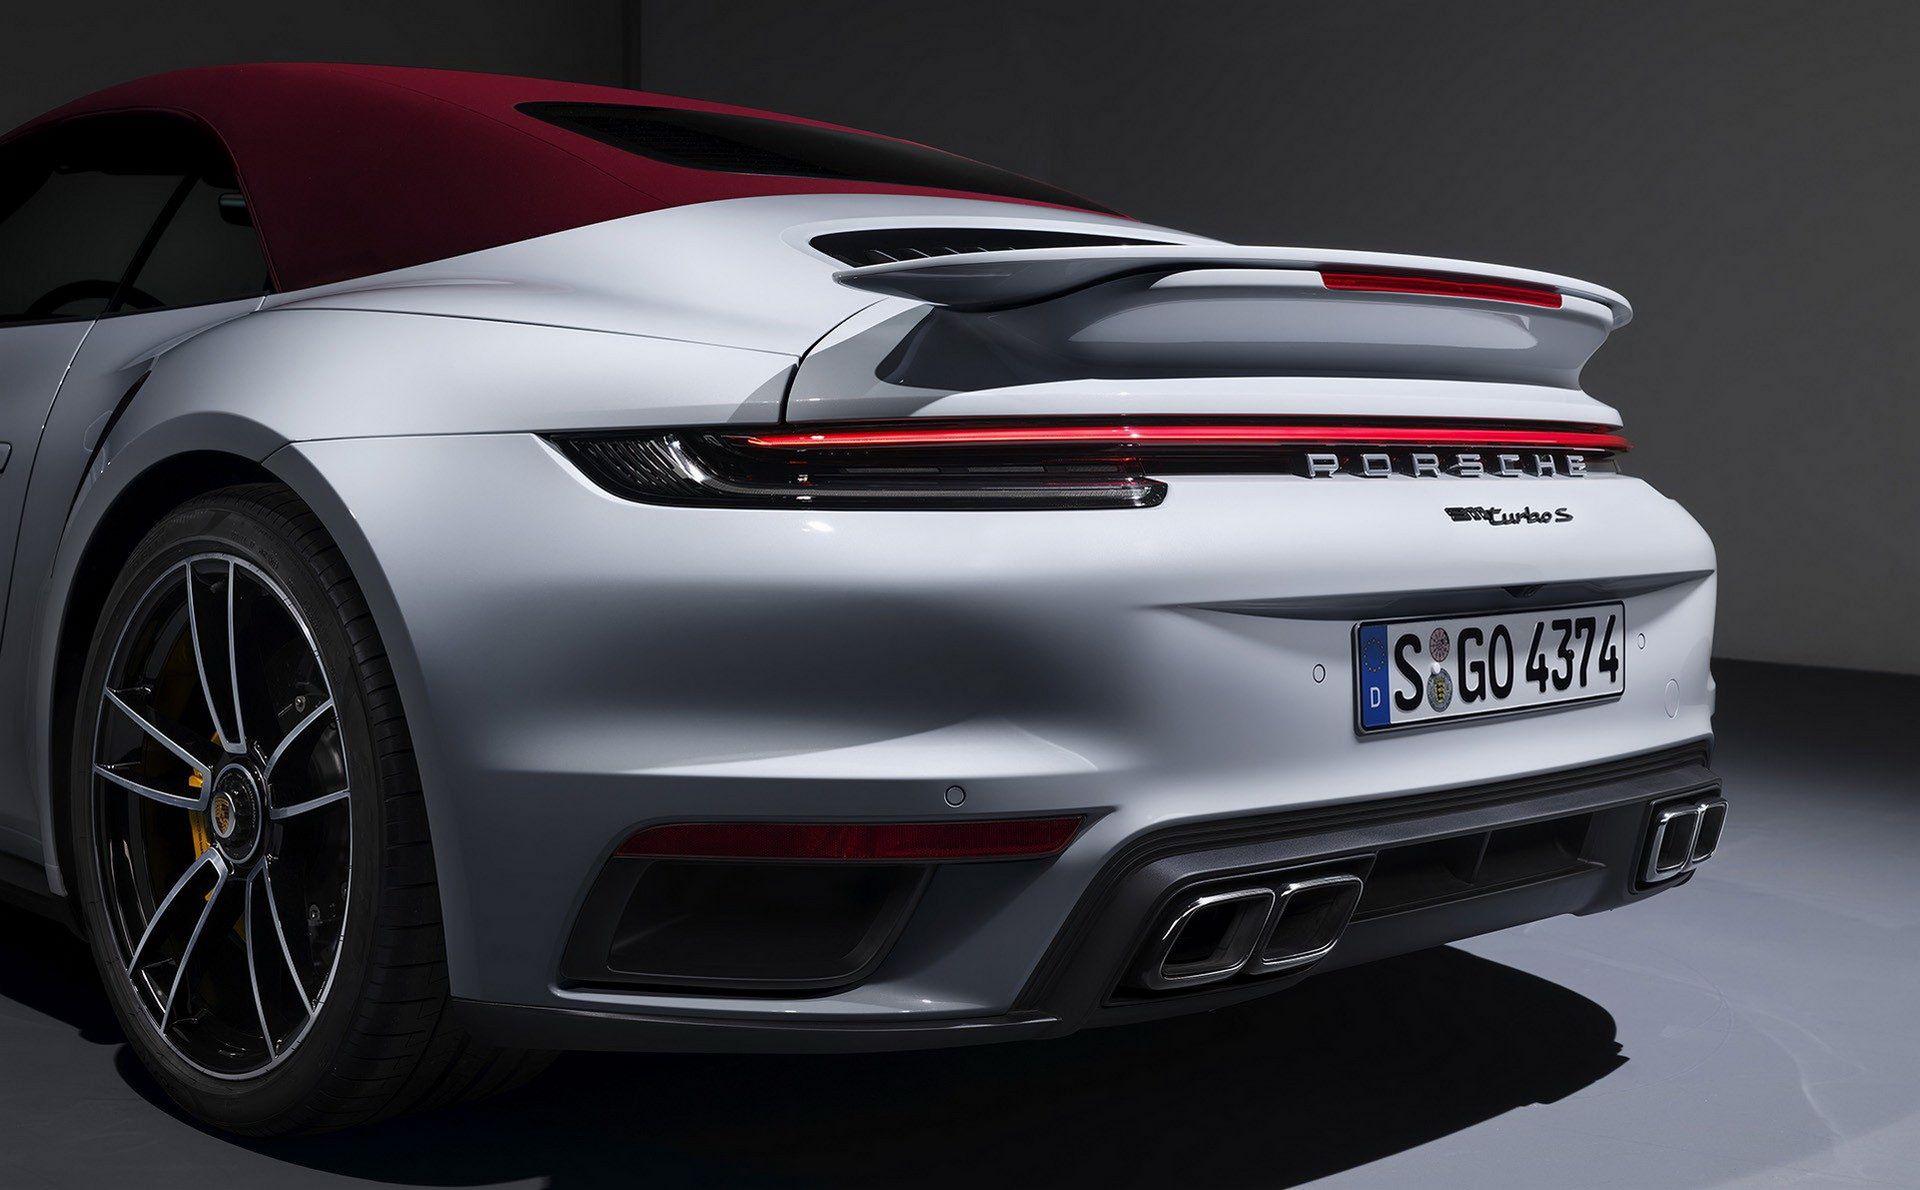 Porsche-911-Turbo-S-2020-47